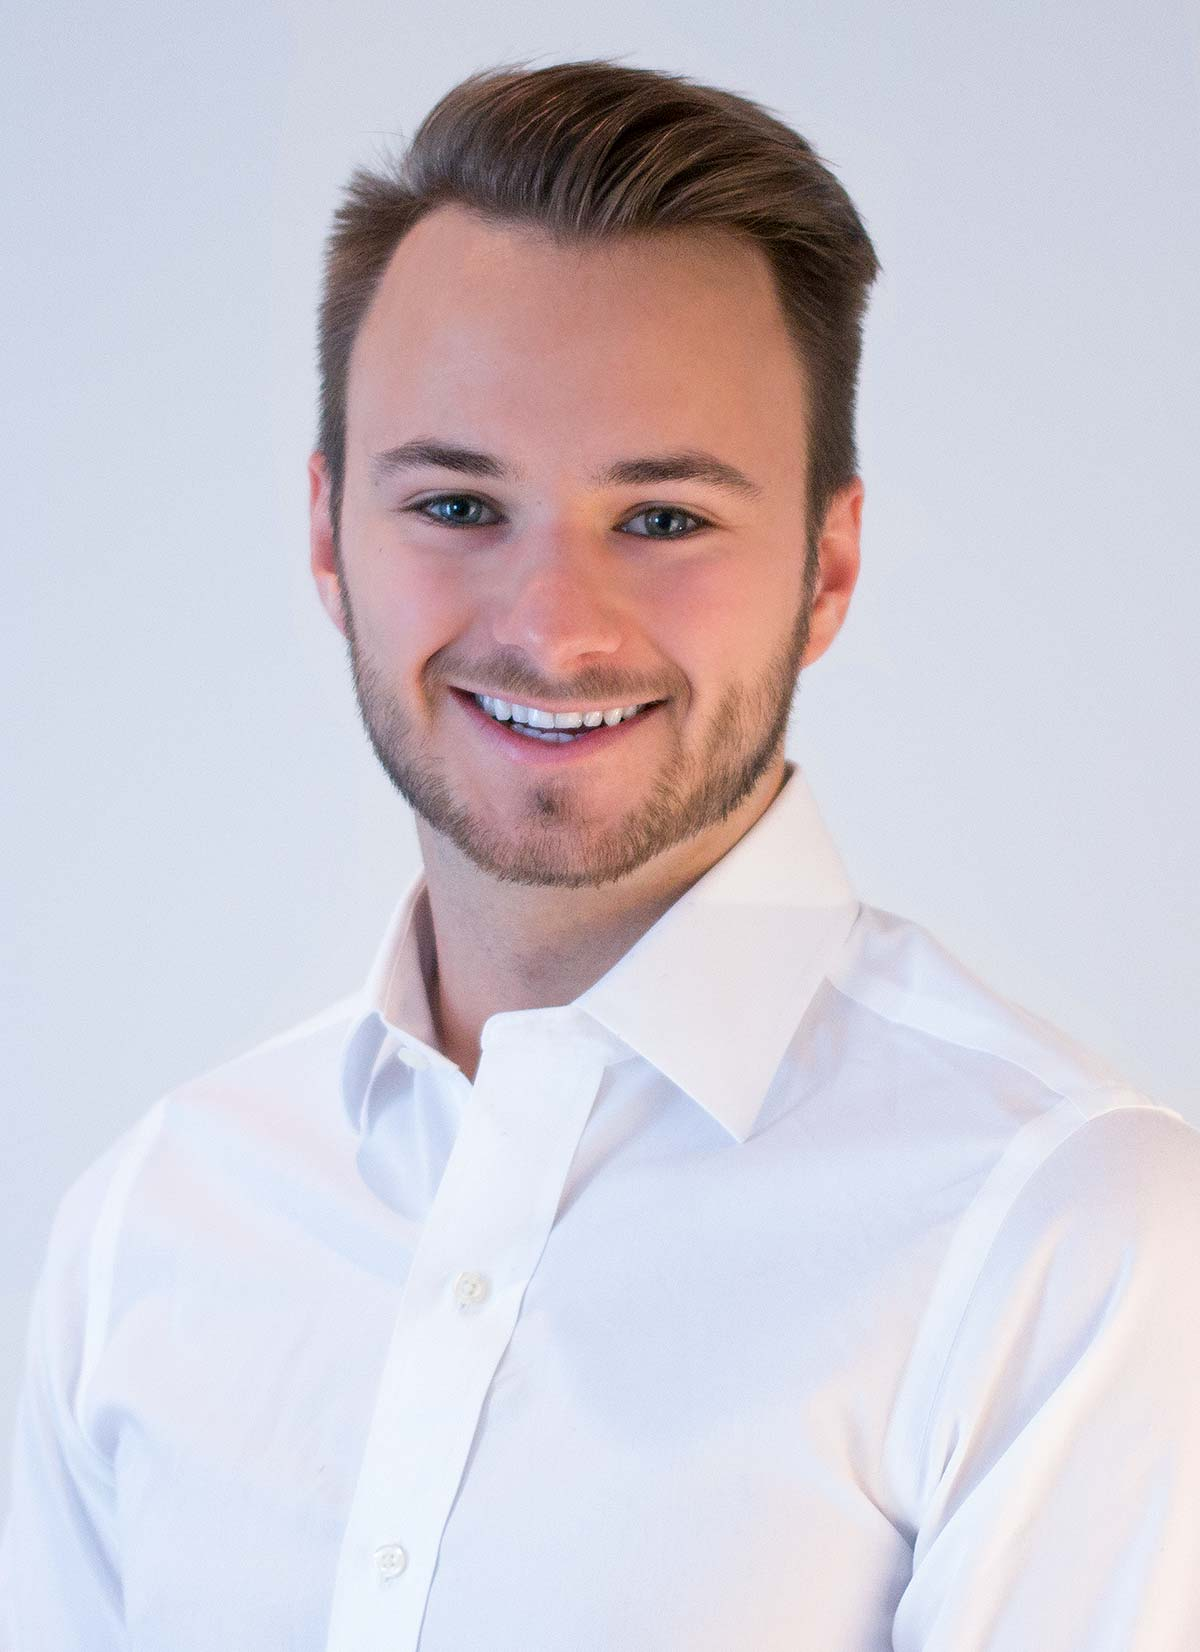 Andreas Zehetner - Geschäftsführer von SVM Bratislava s.r.o.. Medizinstudium Bratislava.